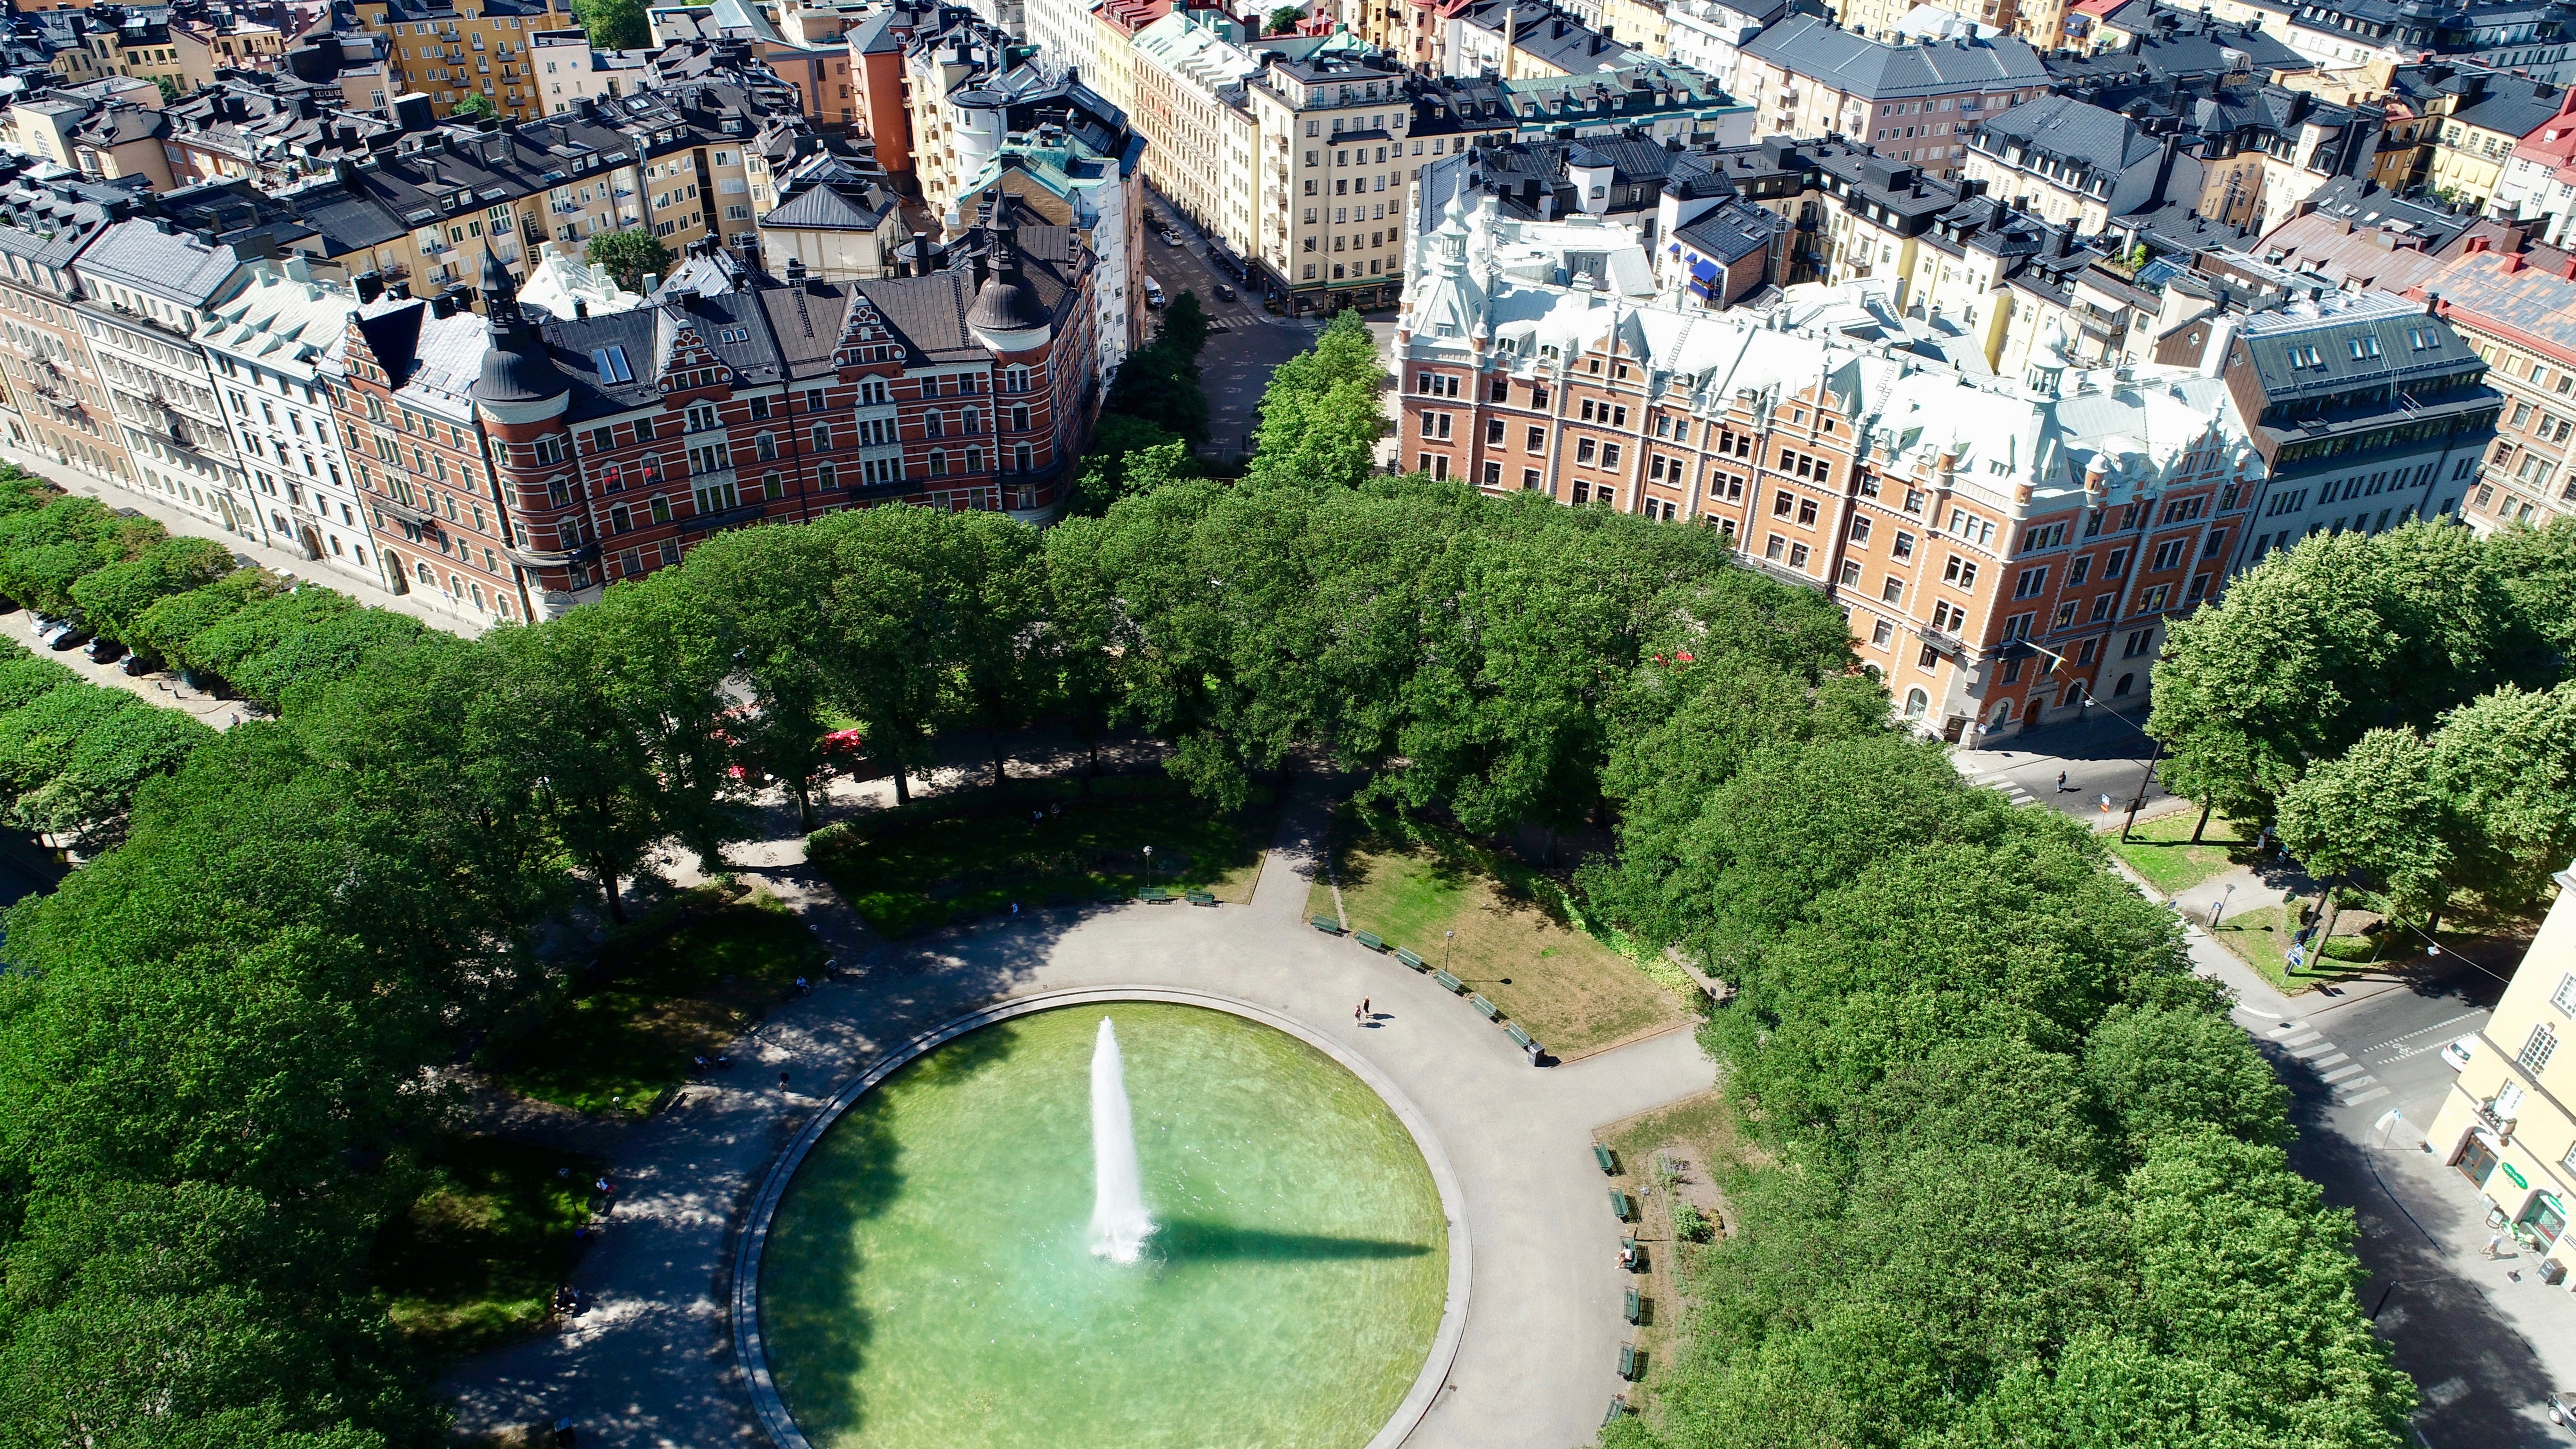 Karlaplan, Östermalm, Stockholm - @karlaplan - karlaplan.com